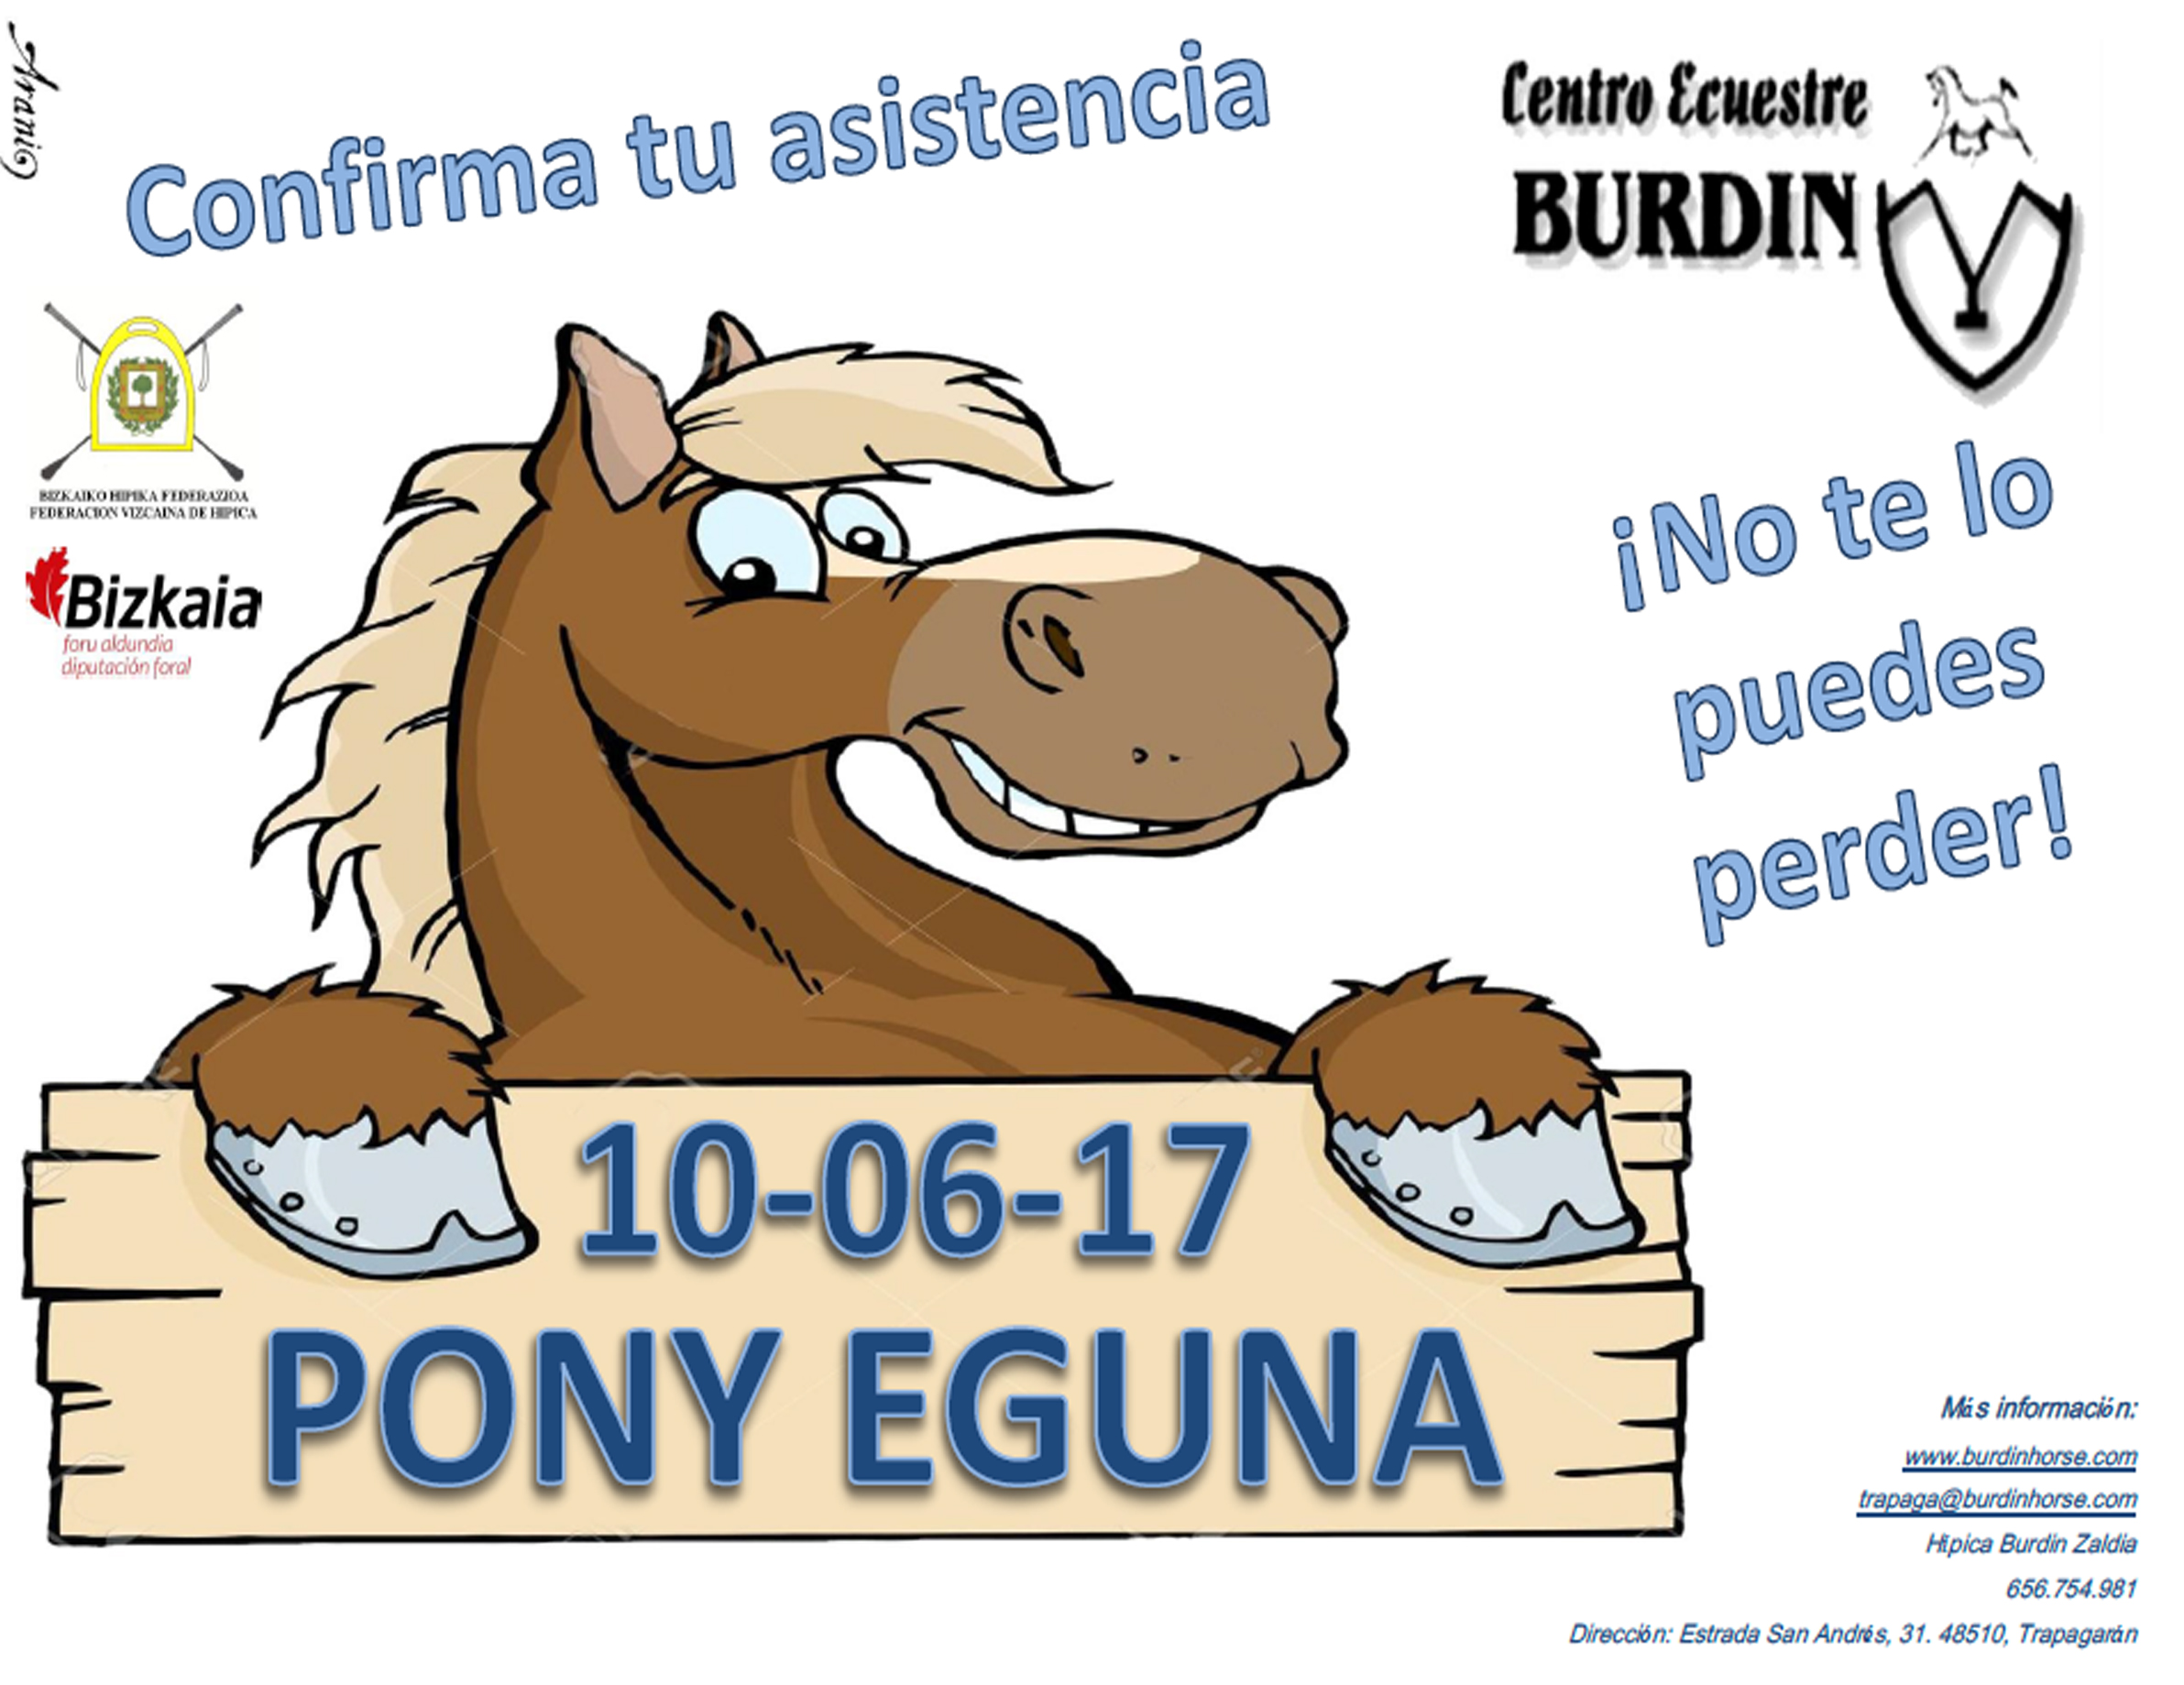 pony eguna 2017